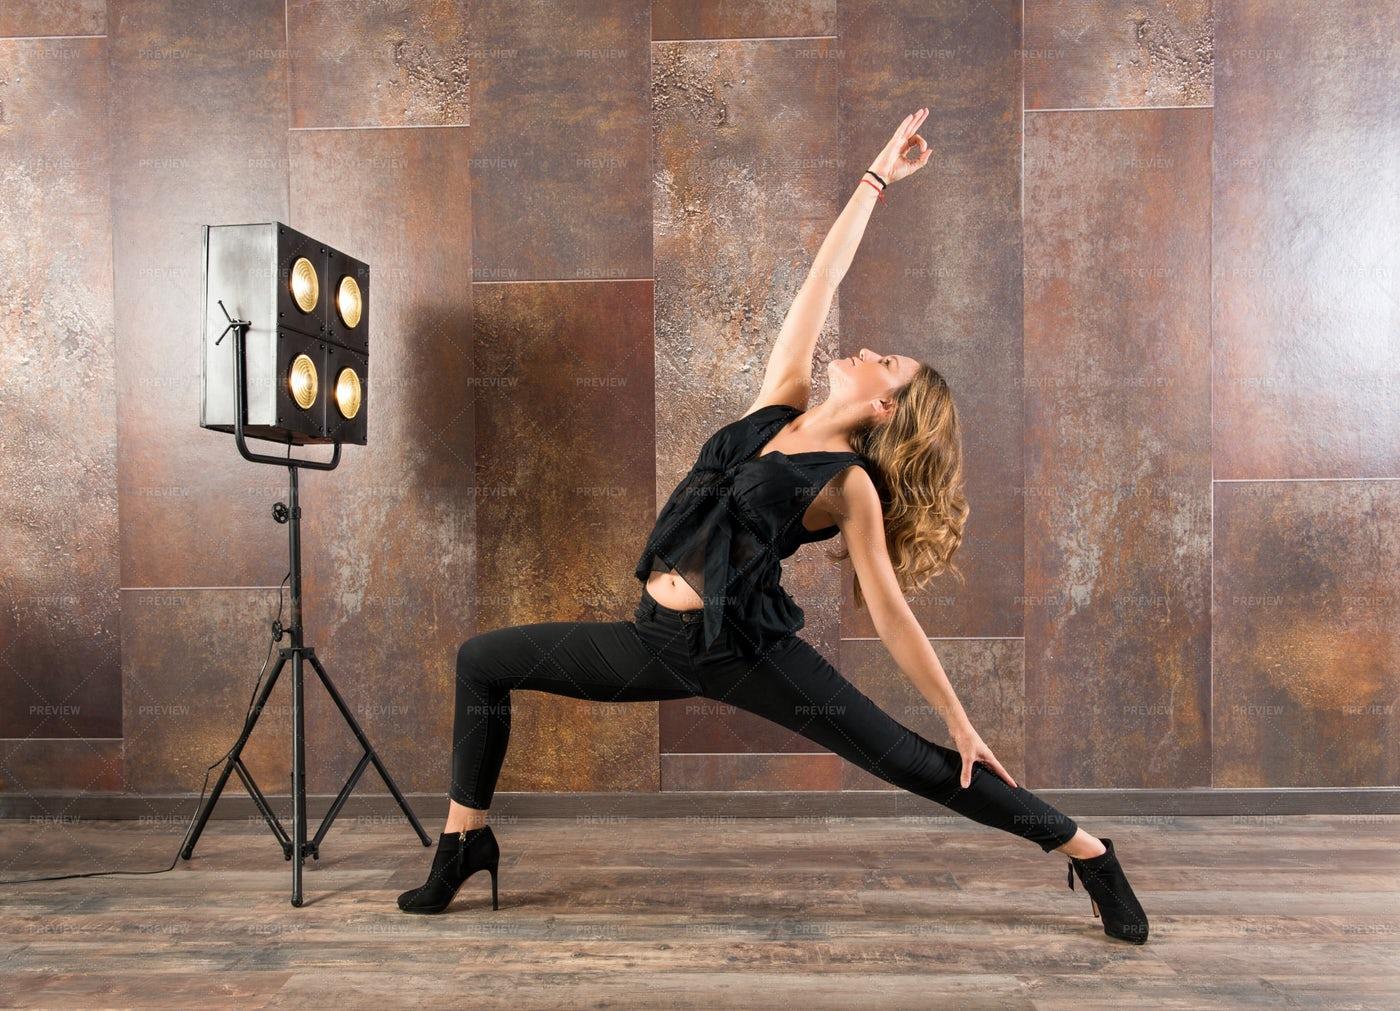 Woman Dancing In A Studio: Stock Photos